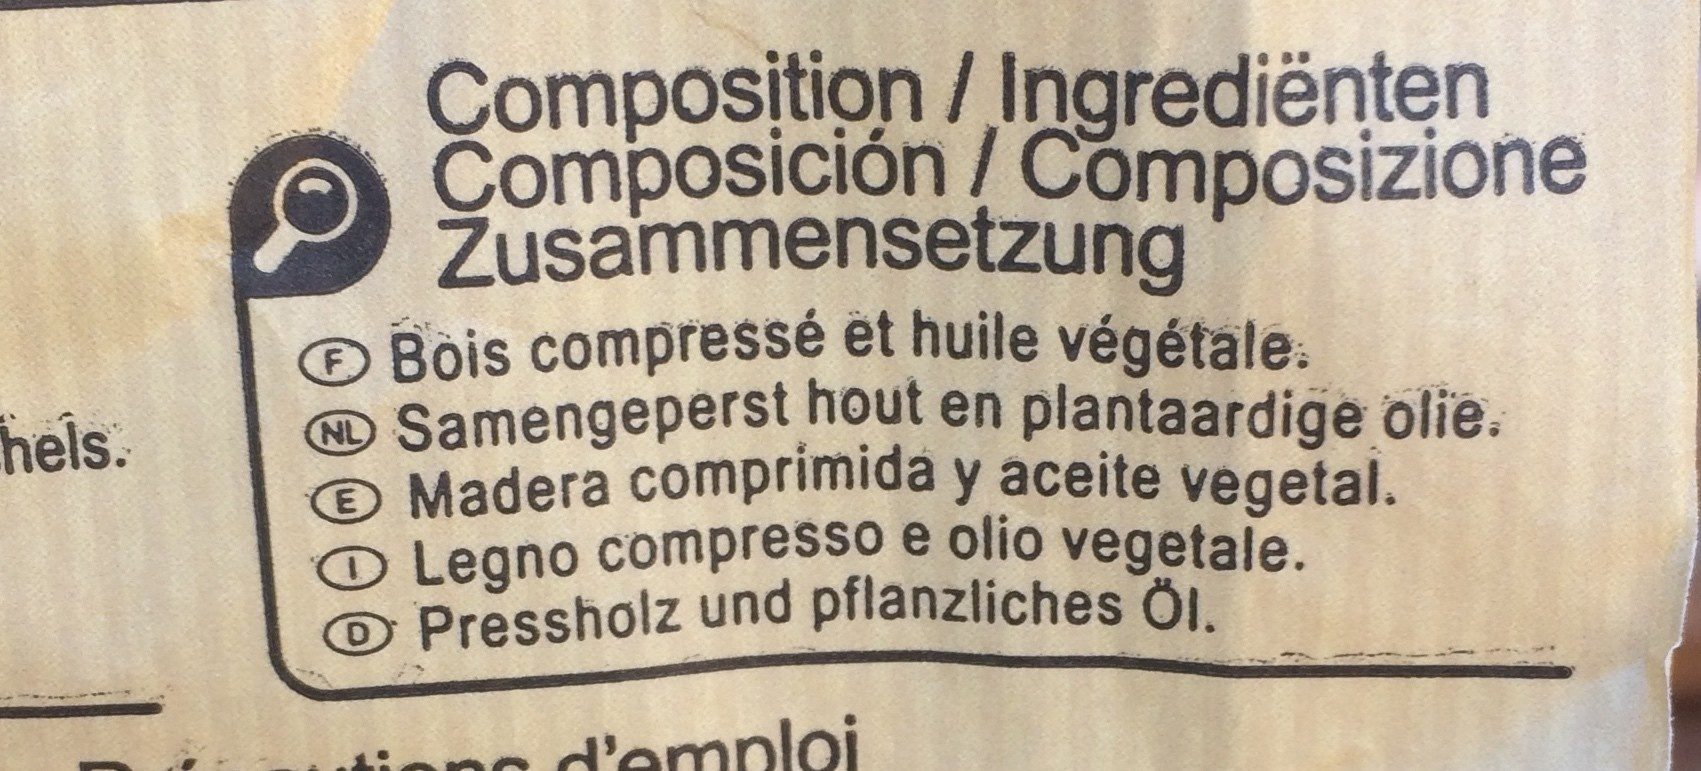 Allume Feu En Bois Compressé x72 - Ingredients - fr